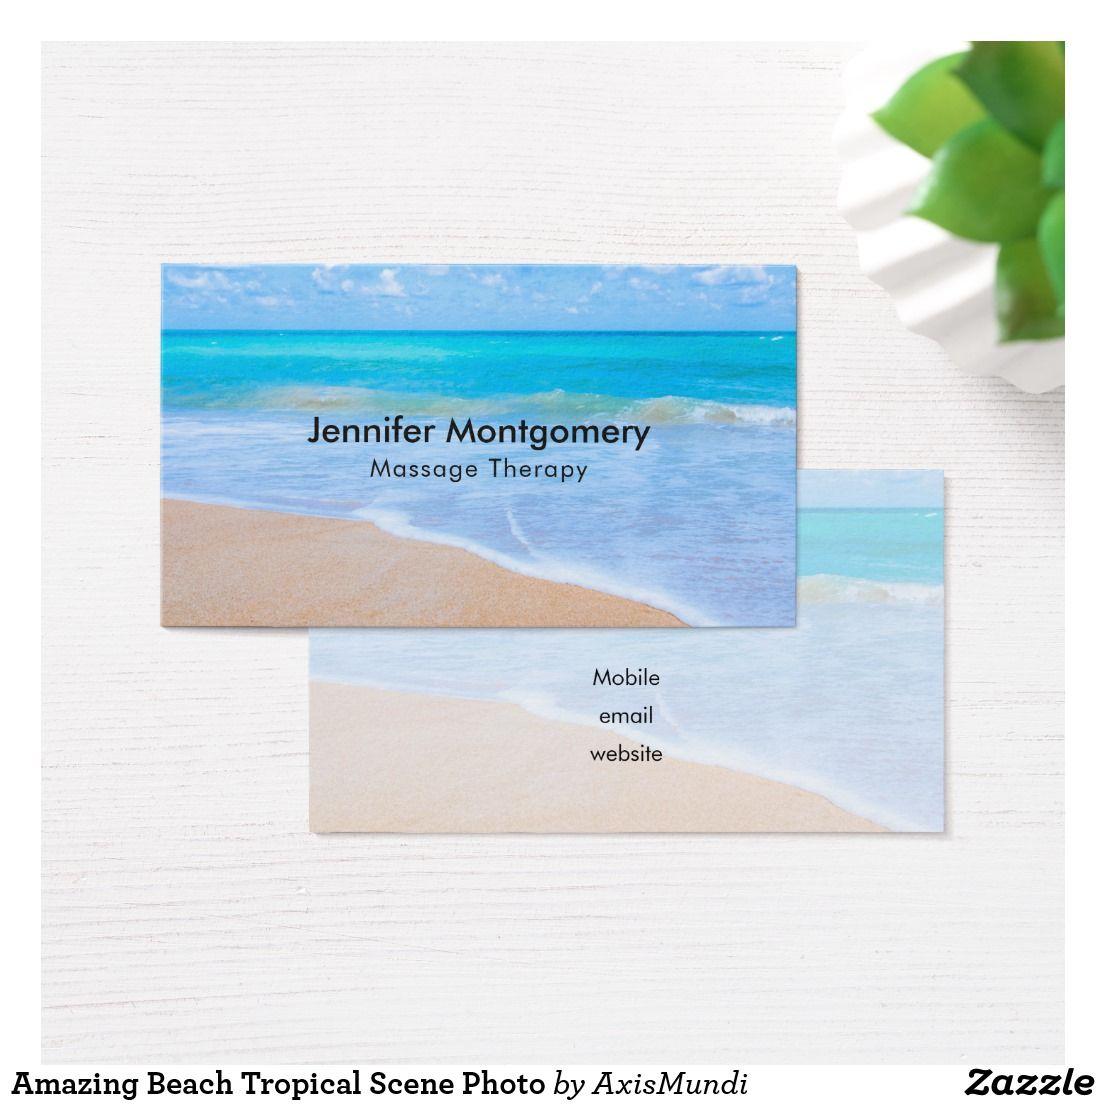 Amazing Beach Tropical Scene Photo Business Card